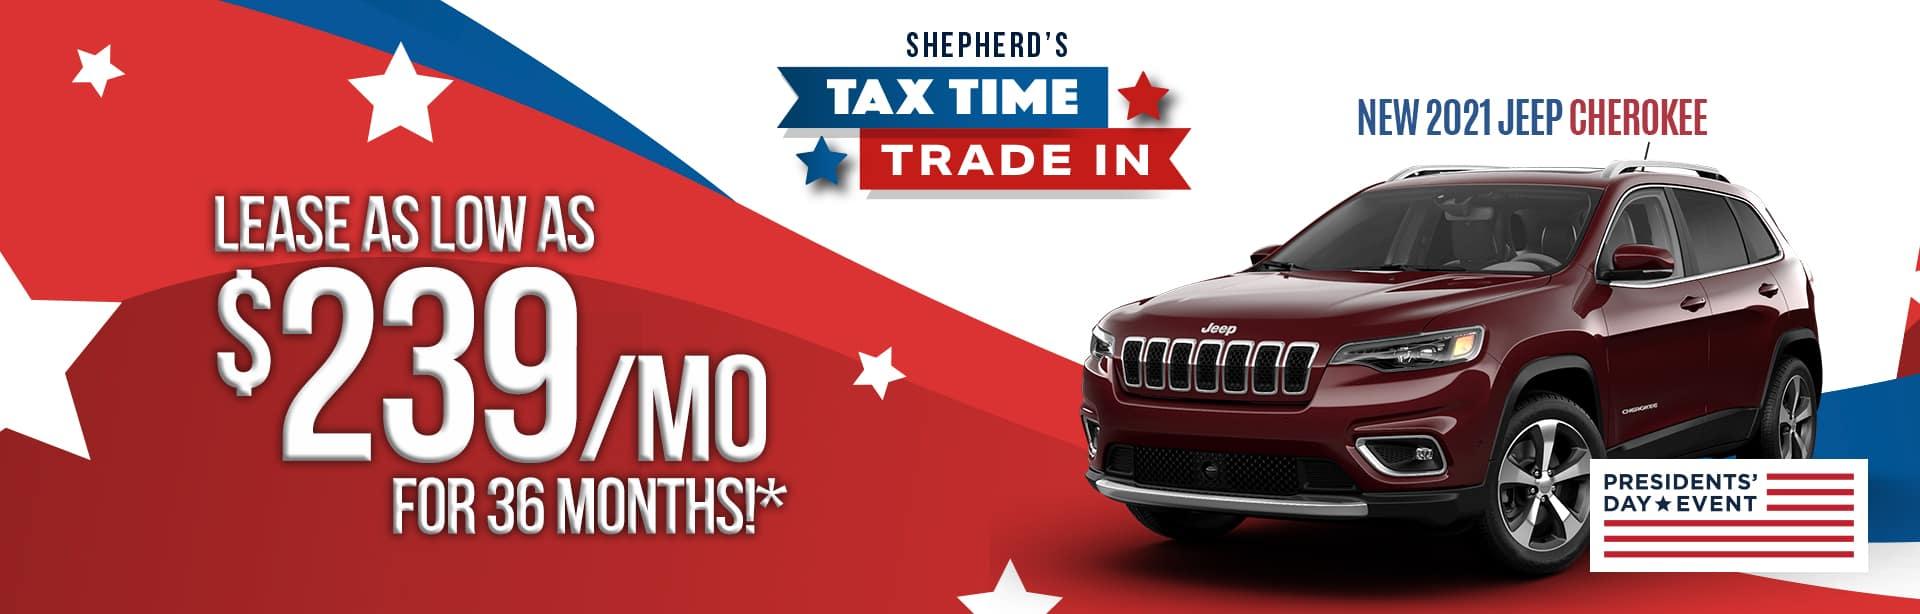 Best lease deal on a new 2021 Jeep Cherokee near Auburn Indiana